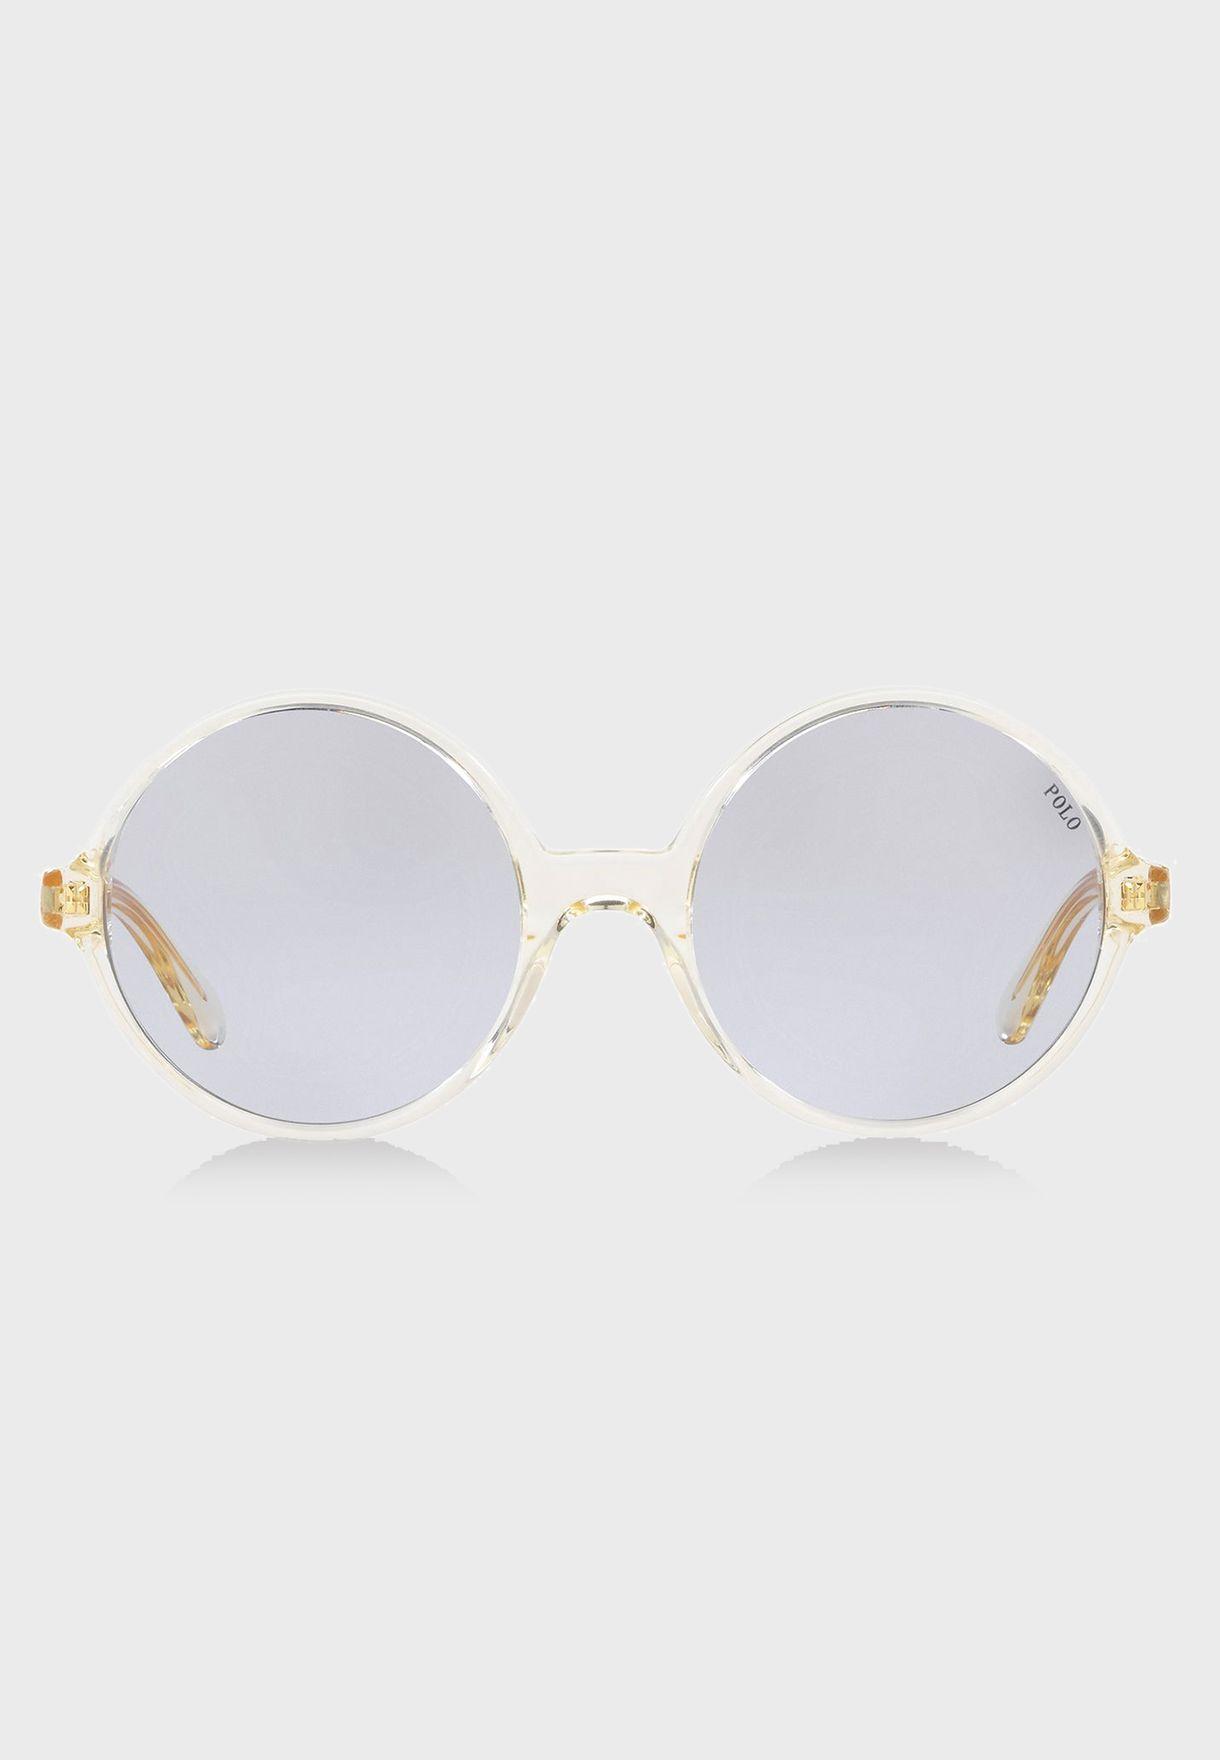 ccb1cf640bd Shop Polo Ralph Lauren clear Round Sunglasses 8.05E+12 for Women in Kuwait  - 13320AC56VDP